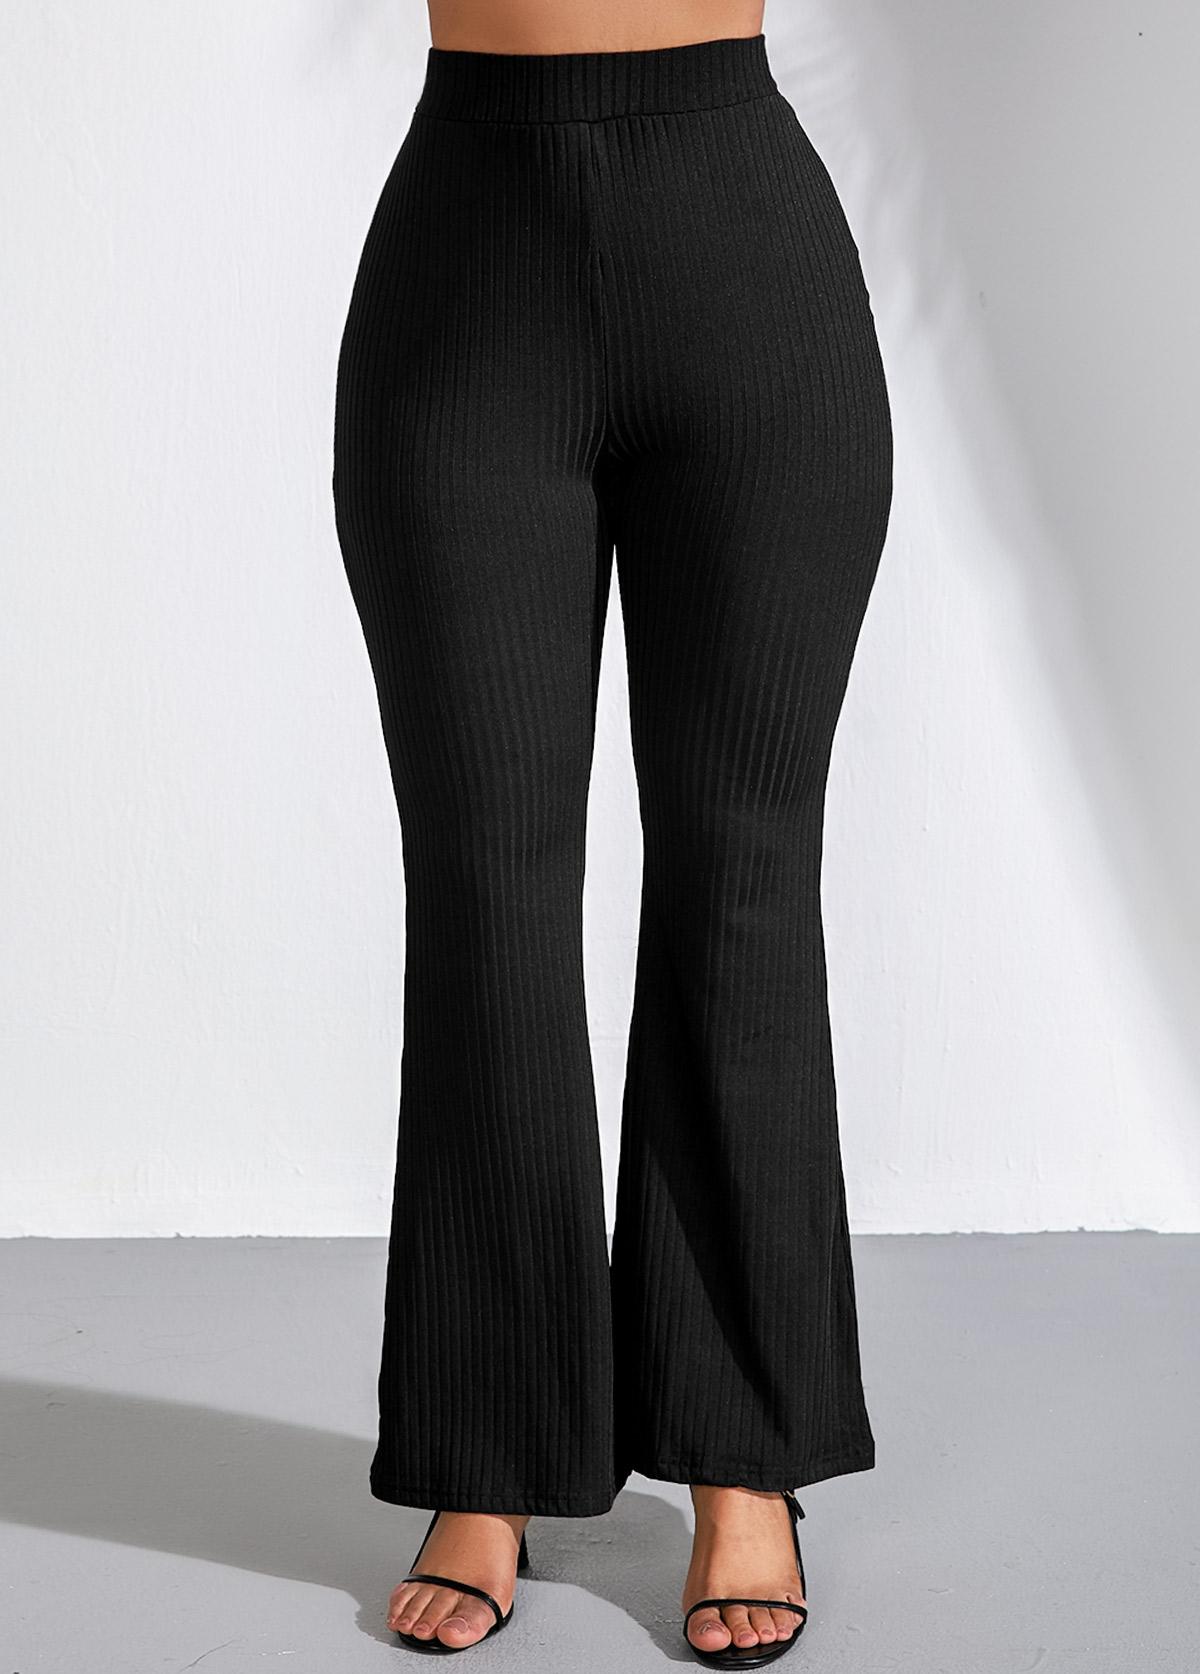 Elastic High Waist Black Flare Pants